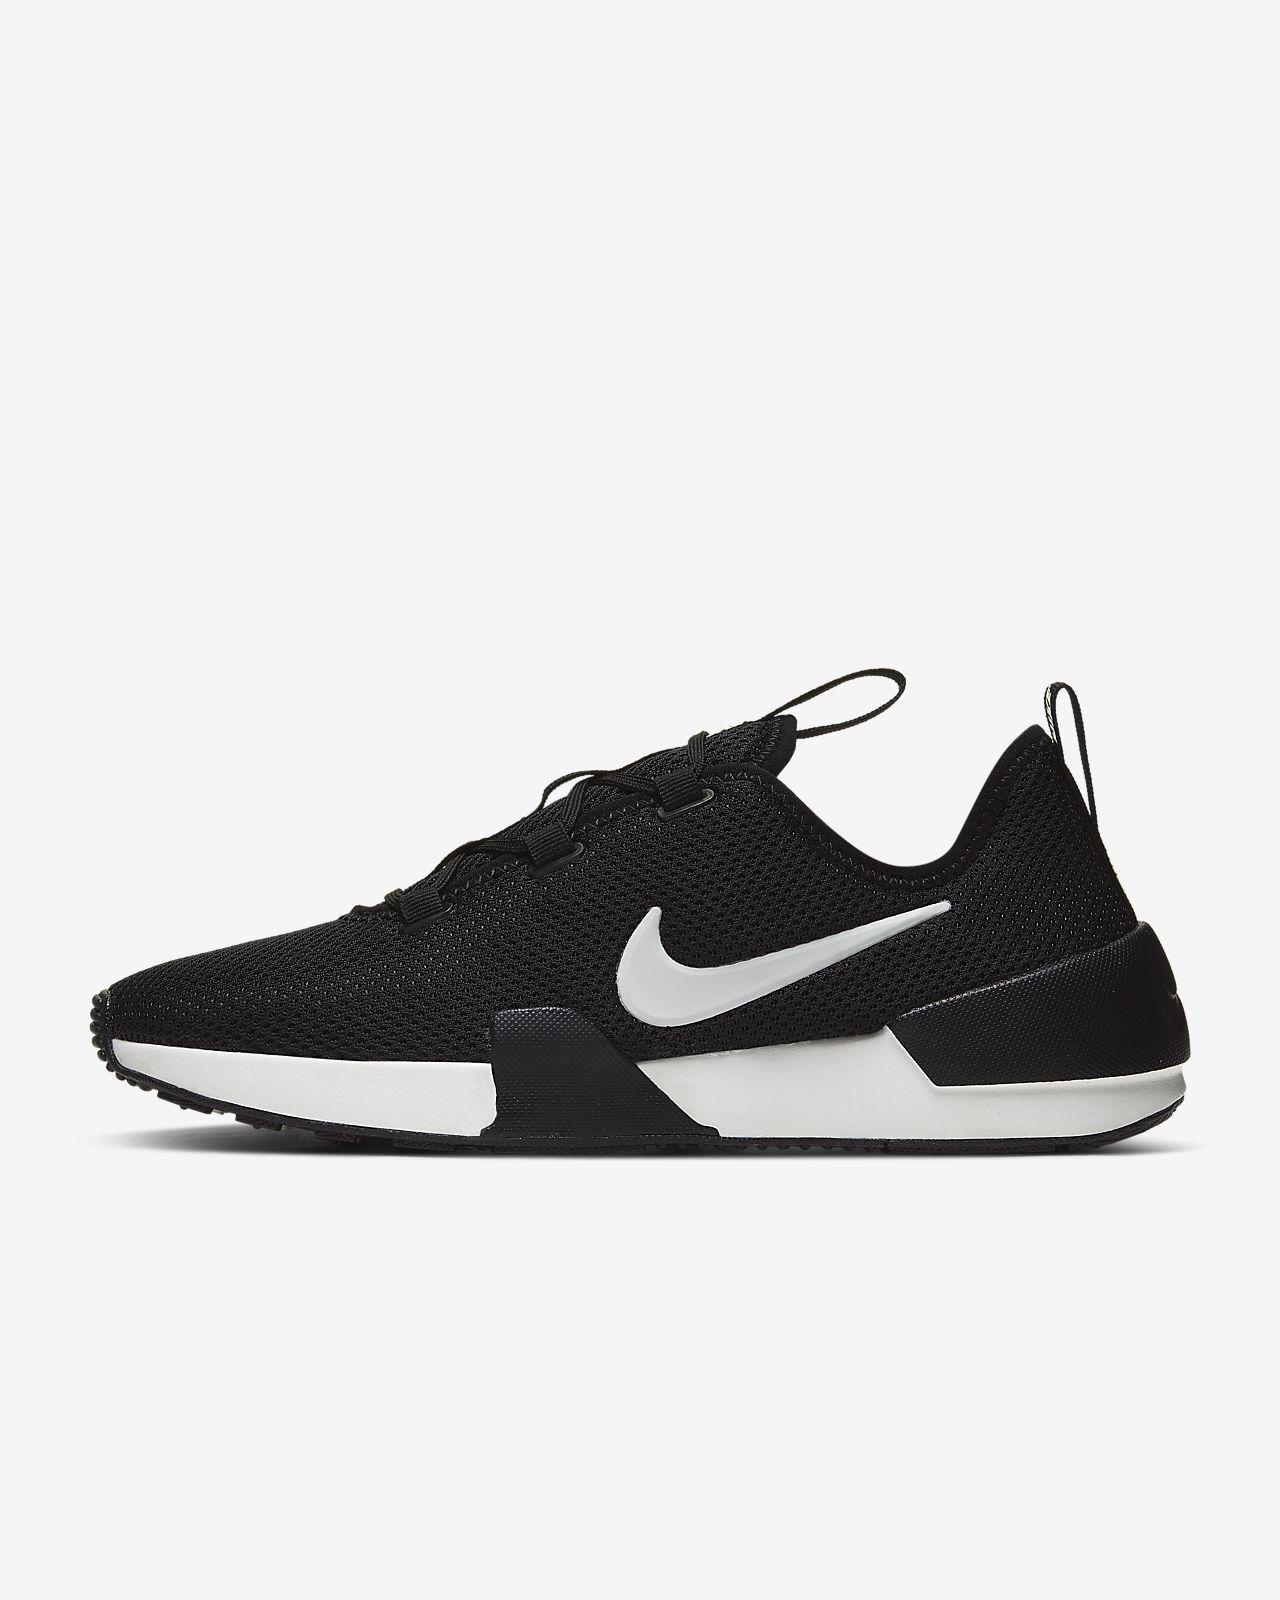 Scarpe Nike Wmns Nike Ashin Modern Run Taglia 38.5 AJ8799002 Nero